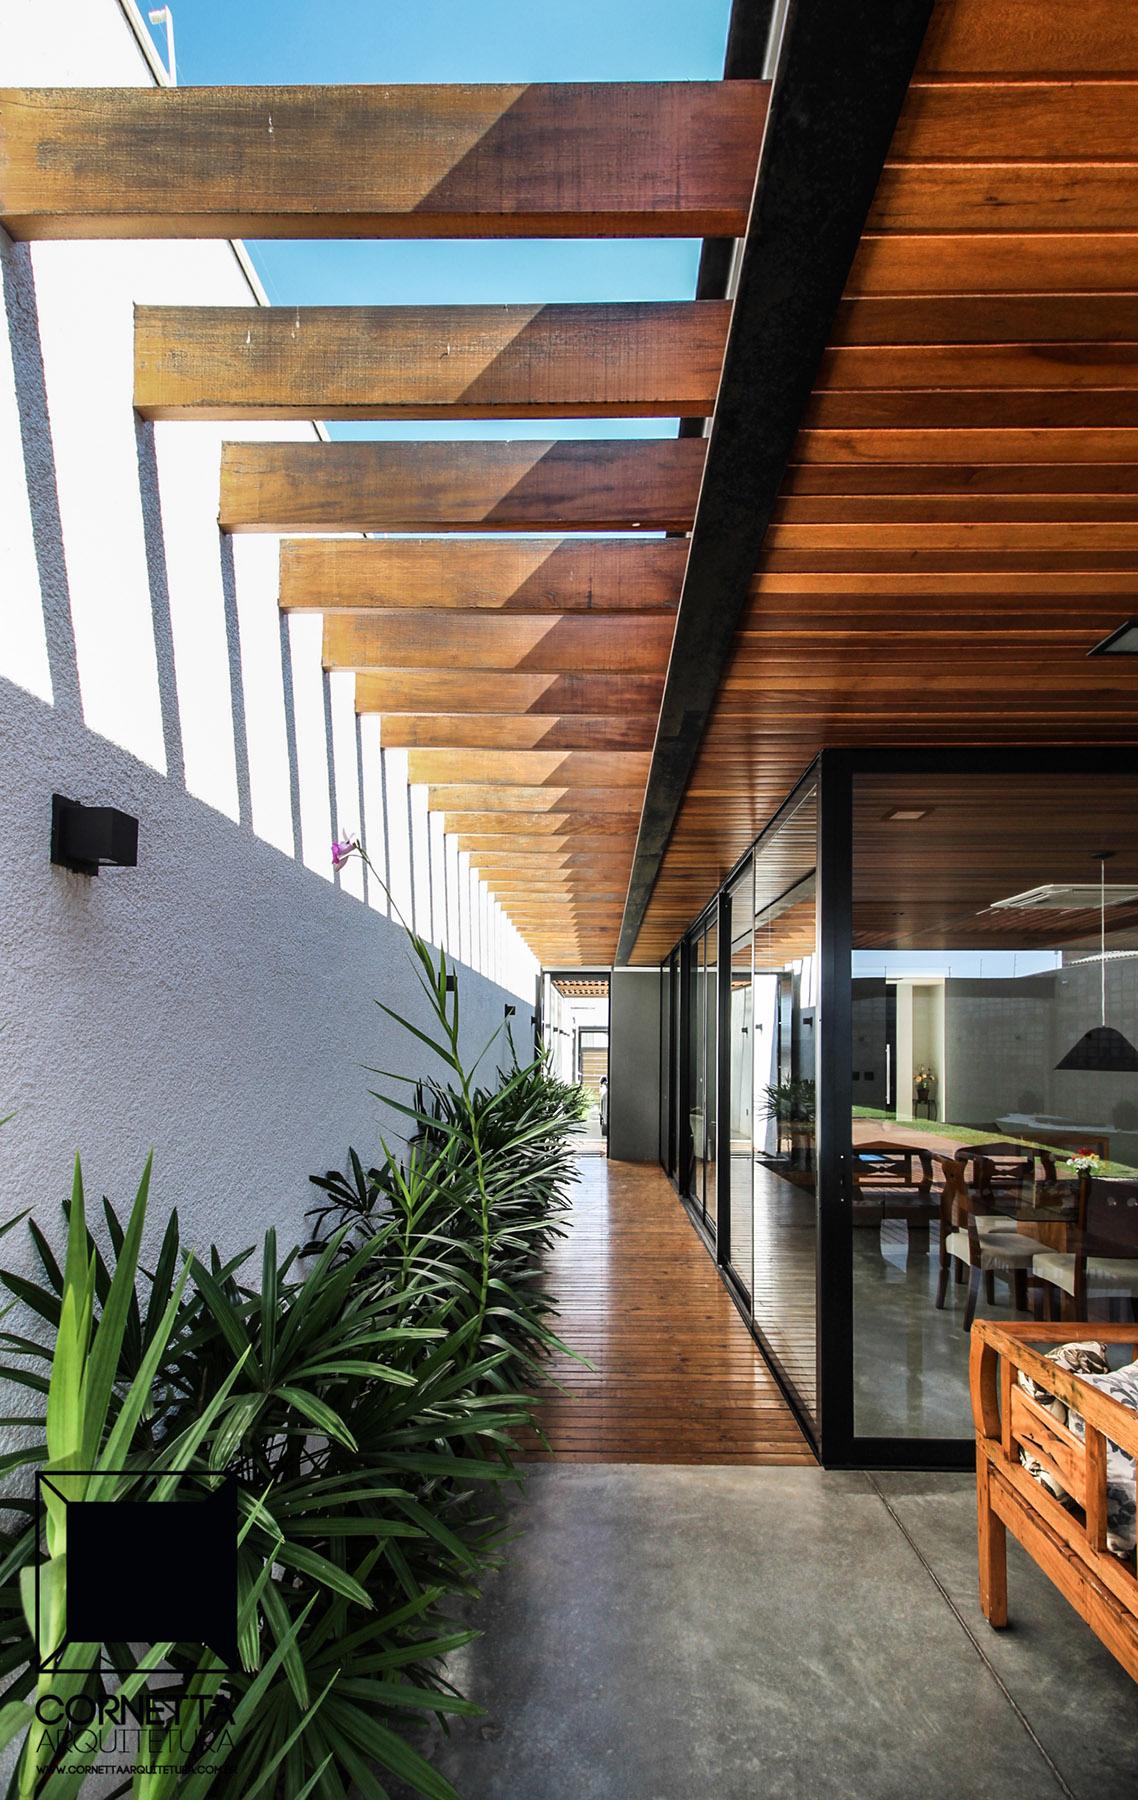 Casa ats cornetta arquitetura for Techumbres modernas